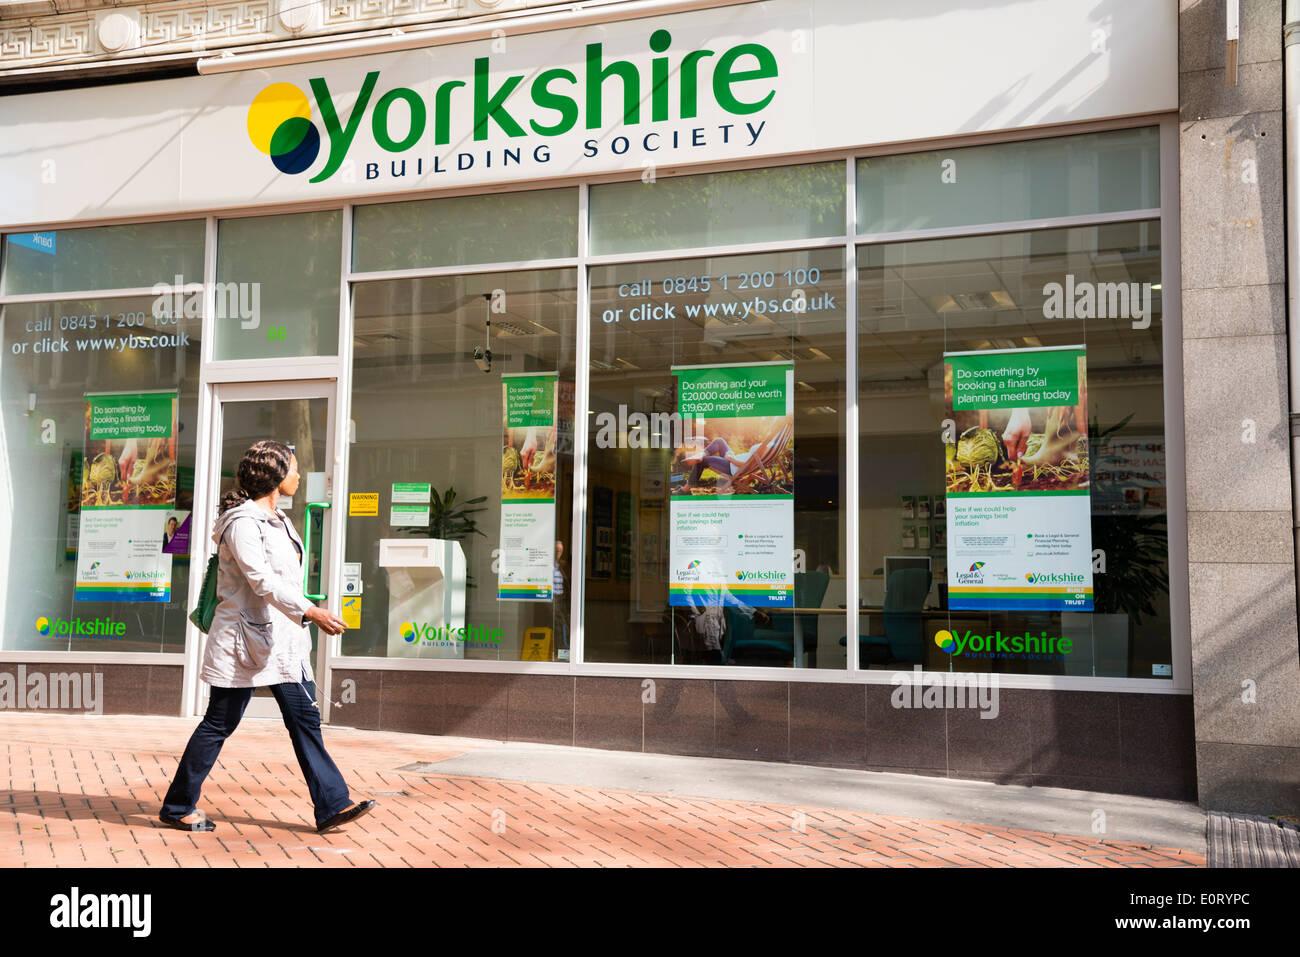 Yorkshire Building Society in Birmingham City Centre, Großbritannien. Stockbild